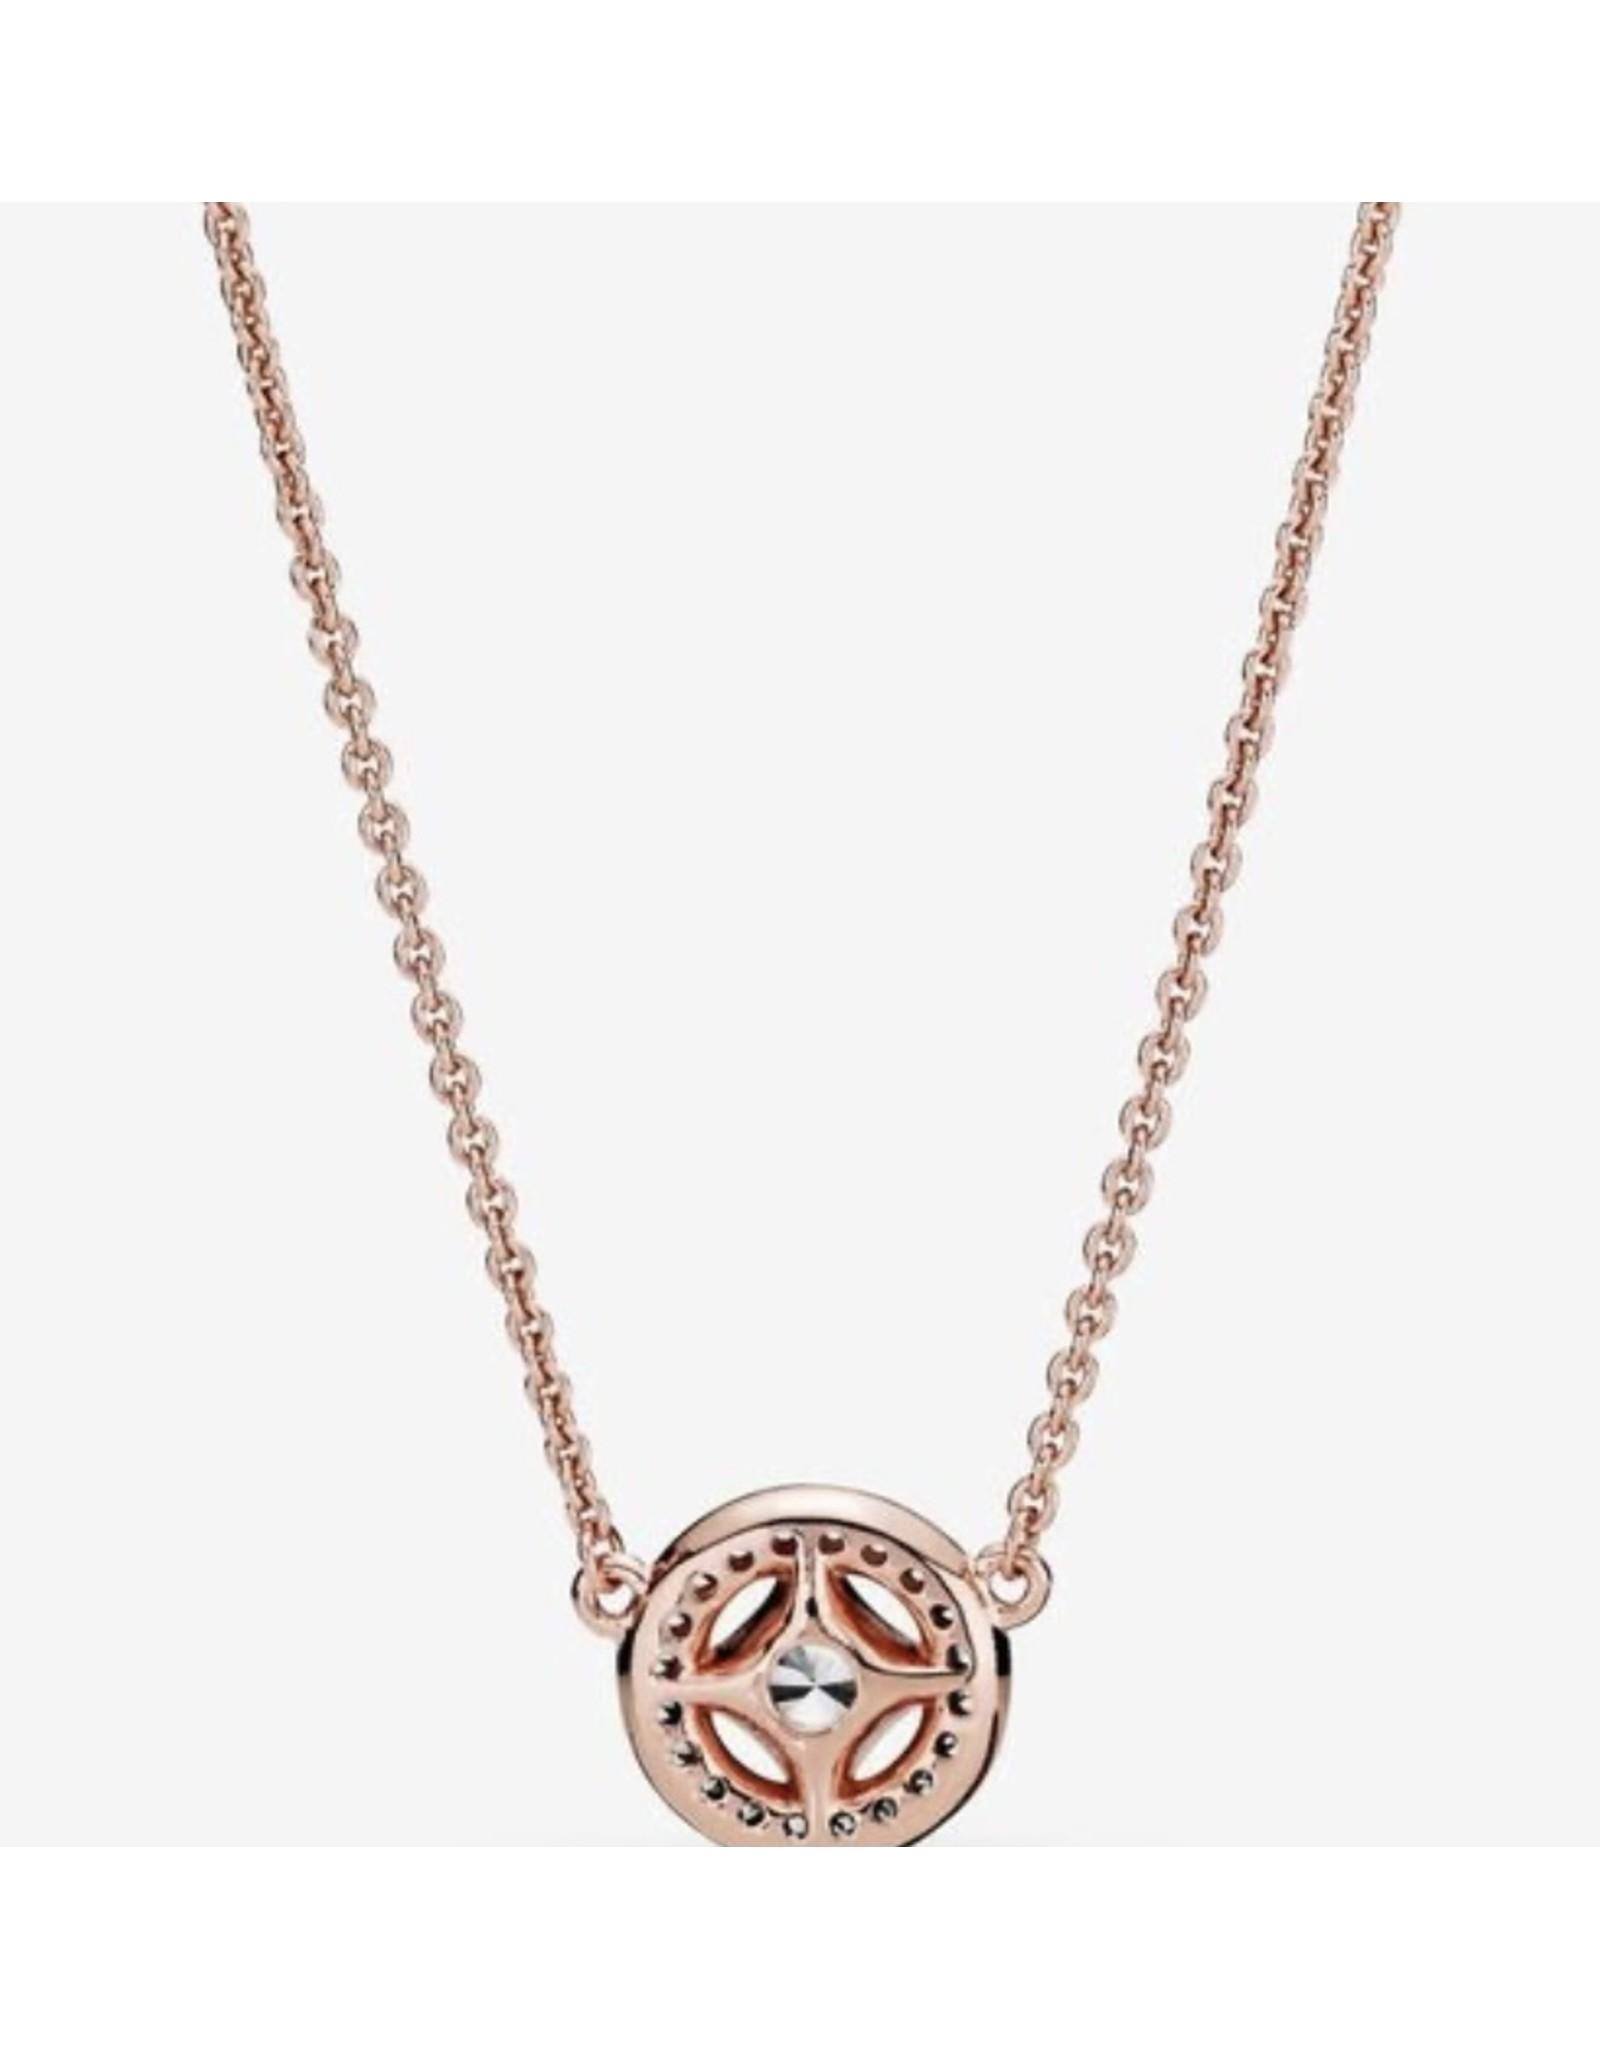 Pandora Pandora Necklace,380523CZ-45, Vintage Circle, Rose Gold